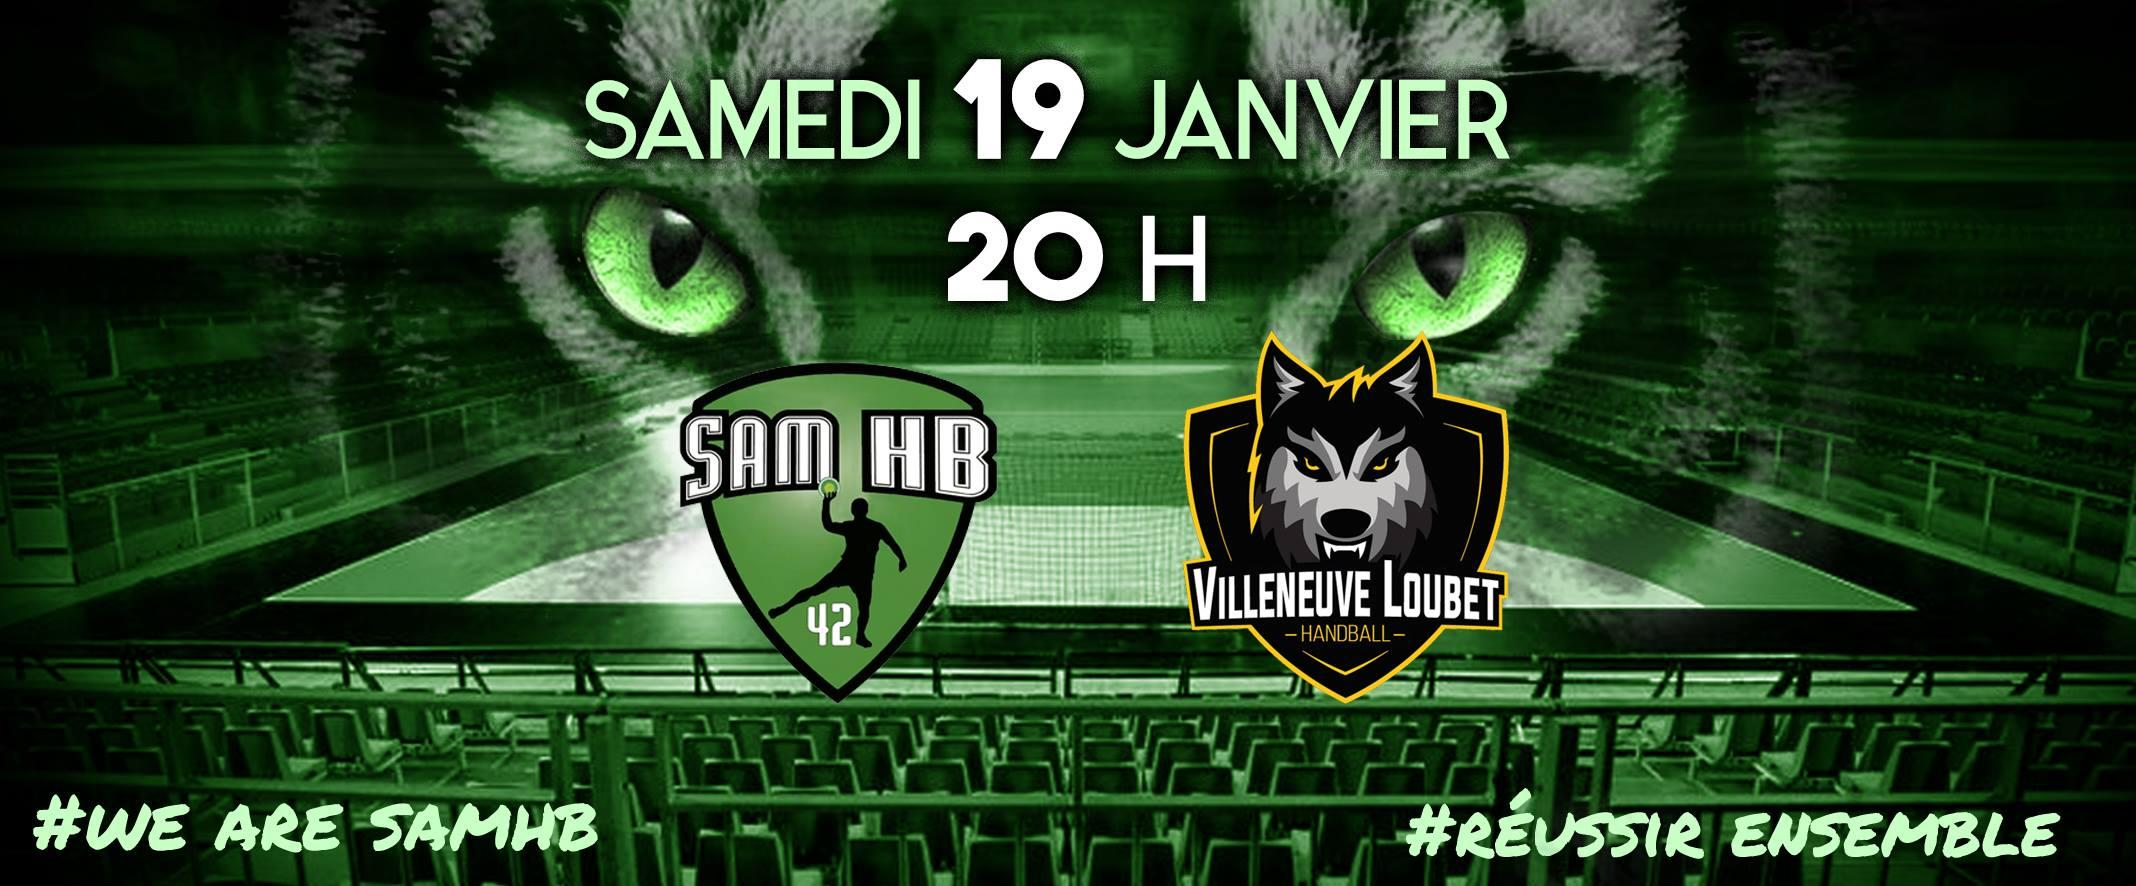 Saint-Etienne Masculin Handball / Villeneuve Loubet